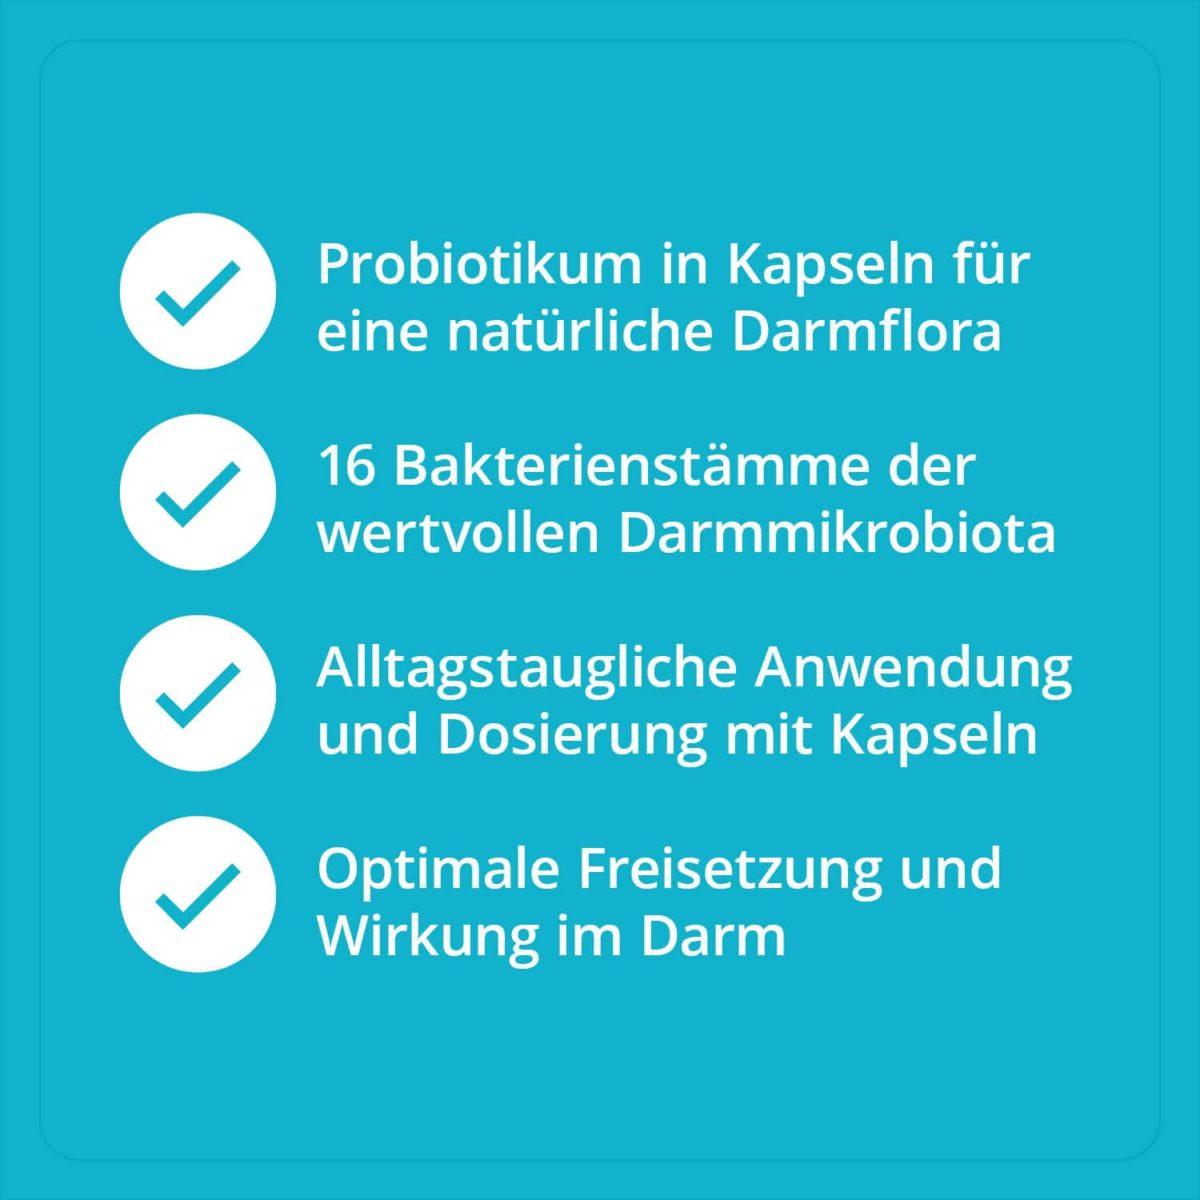 Probiotics complex capsules with inulin – 120 Stk. 14446656 PZN Apotheke Darmflora Darmmikrobiota Darmsanierung7